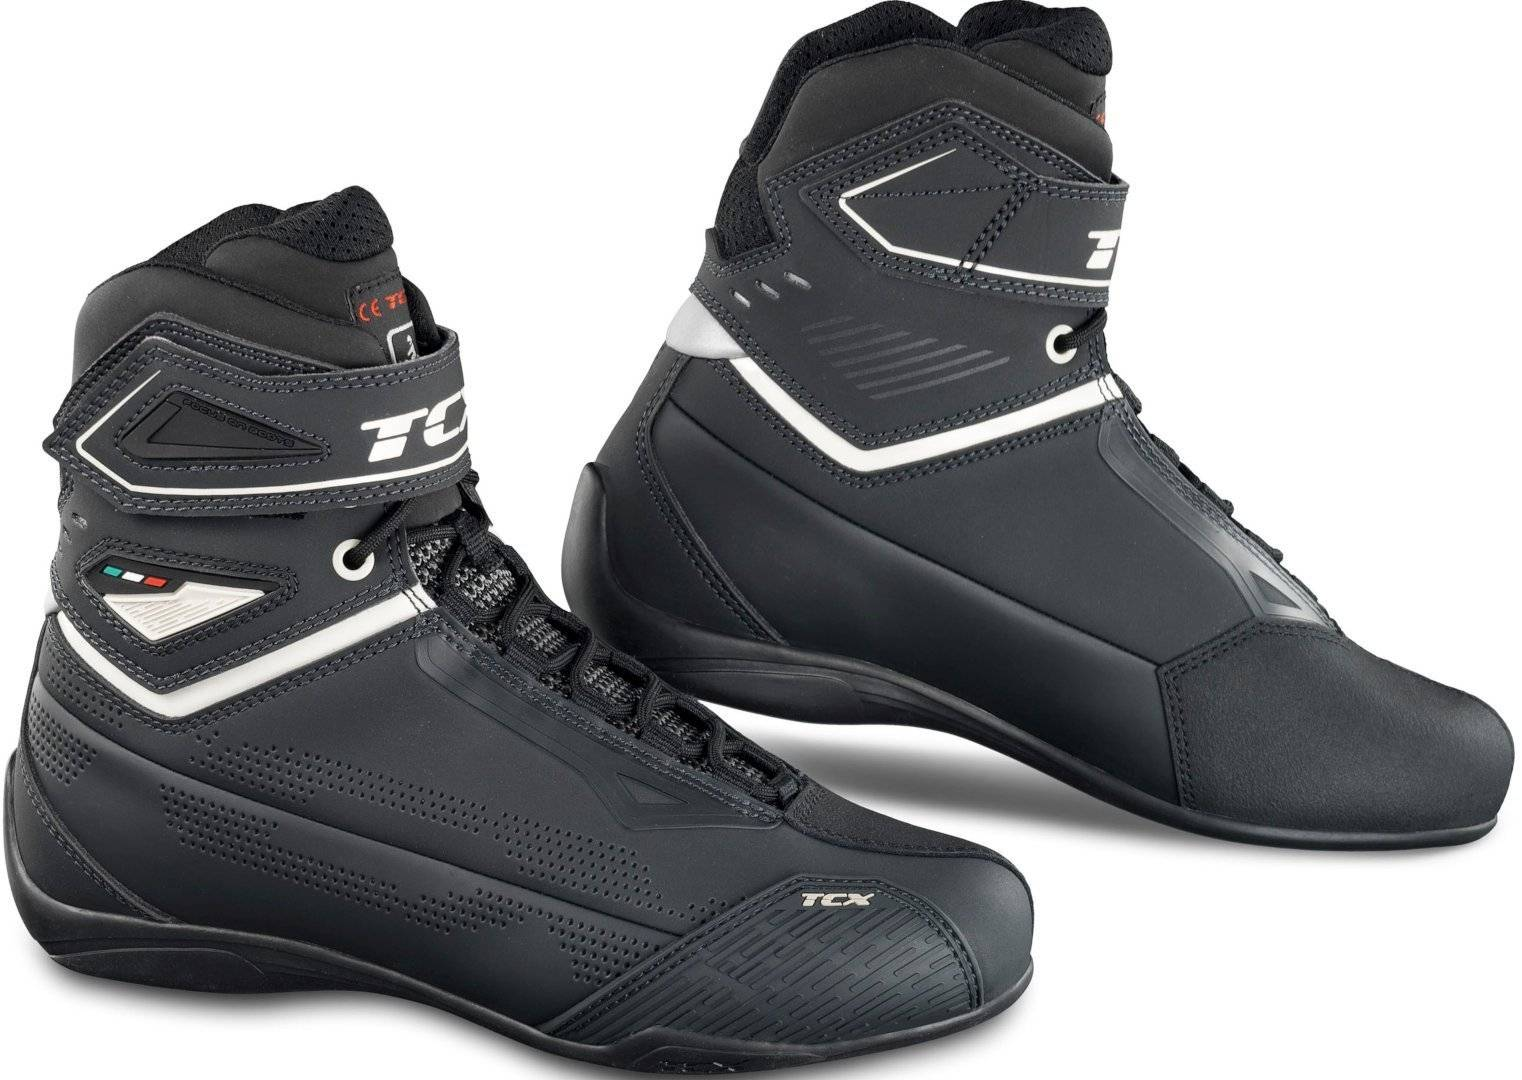 TCX Rush 2 Air Limited Edition Scarpe da moto perforate Ladies Nero Bianco 39